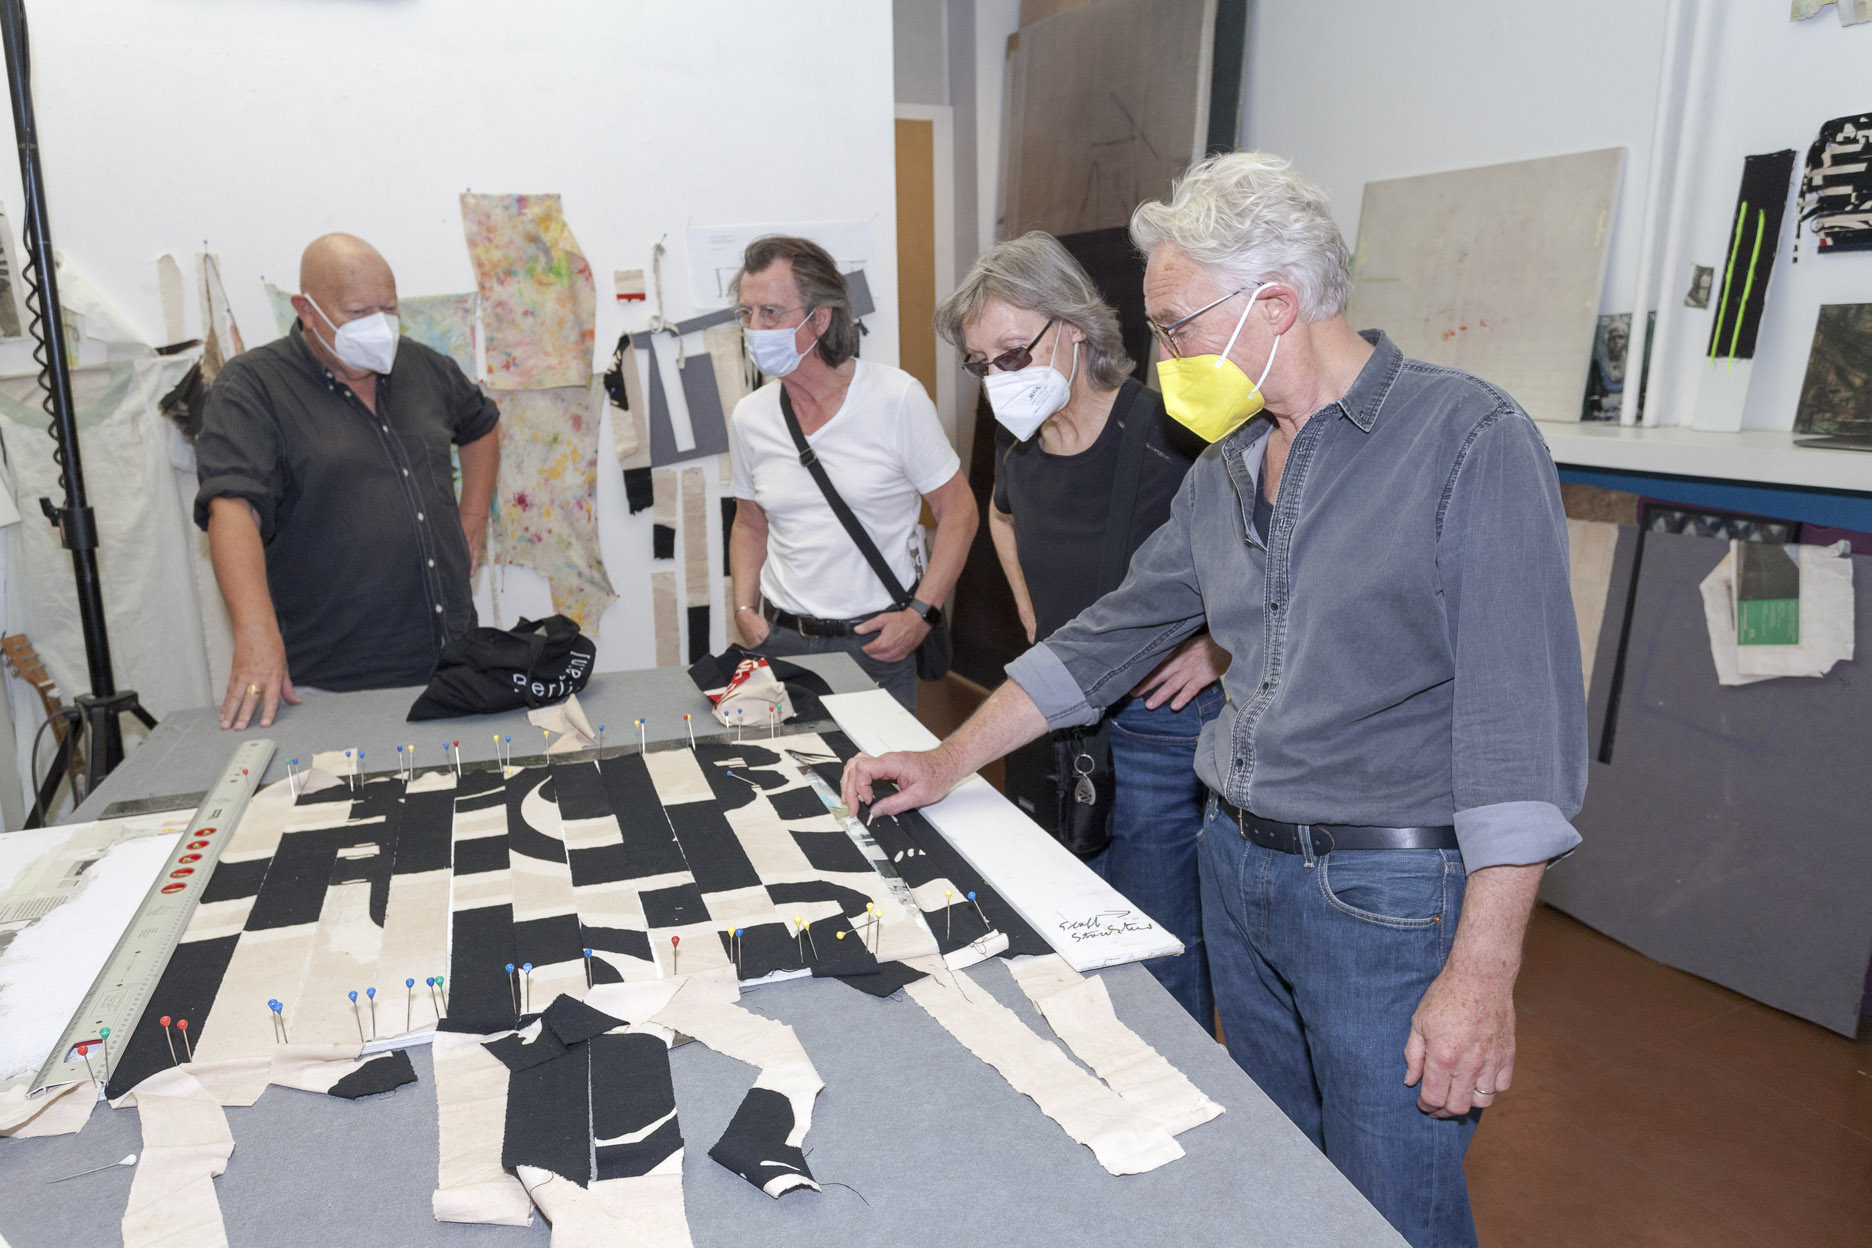 Atelierspaziergang am 14.08.2021, mit Dr. Peter Funken, Atelier Fischer